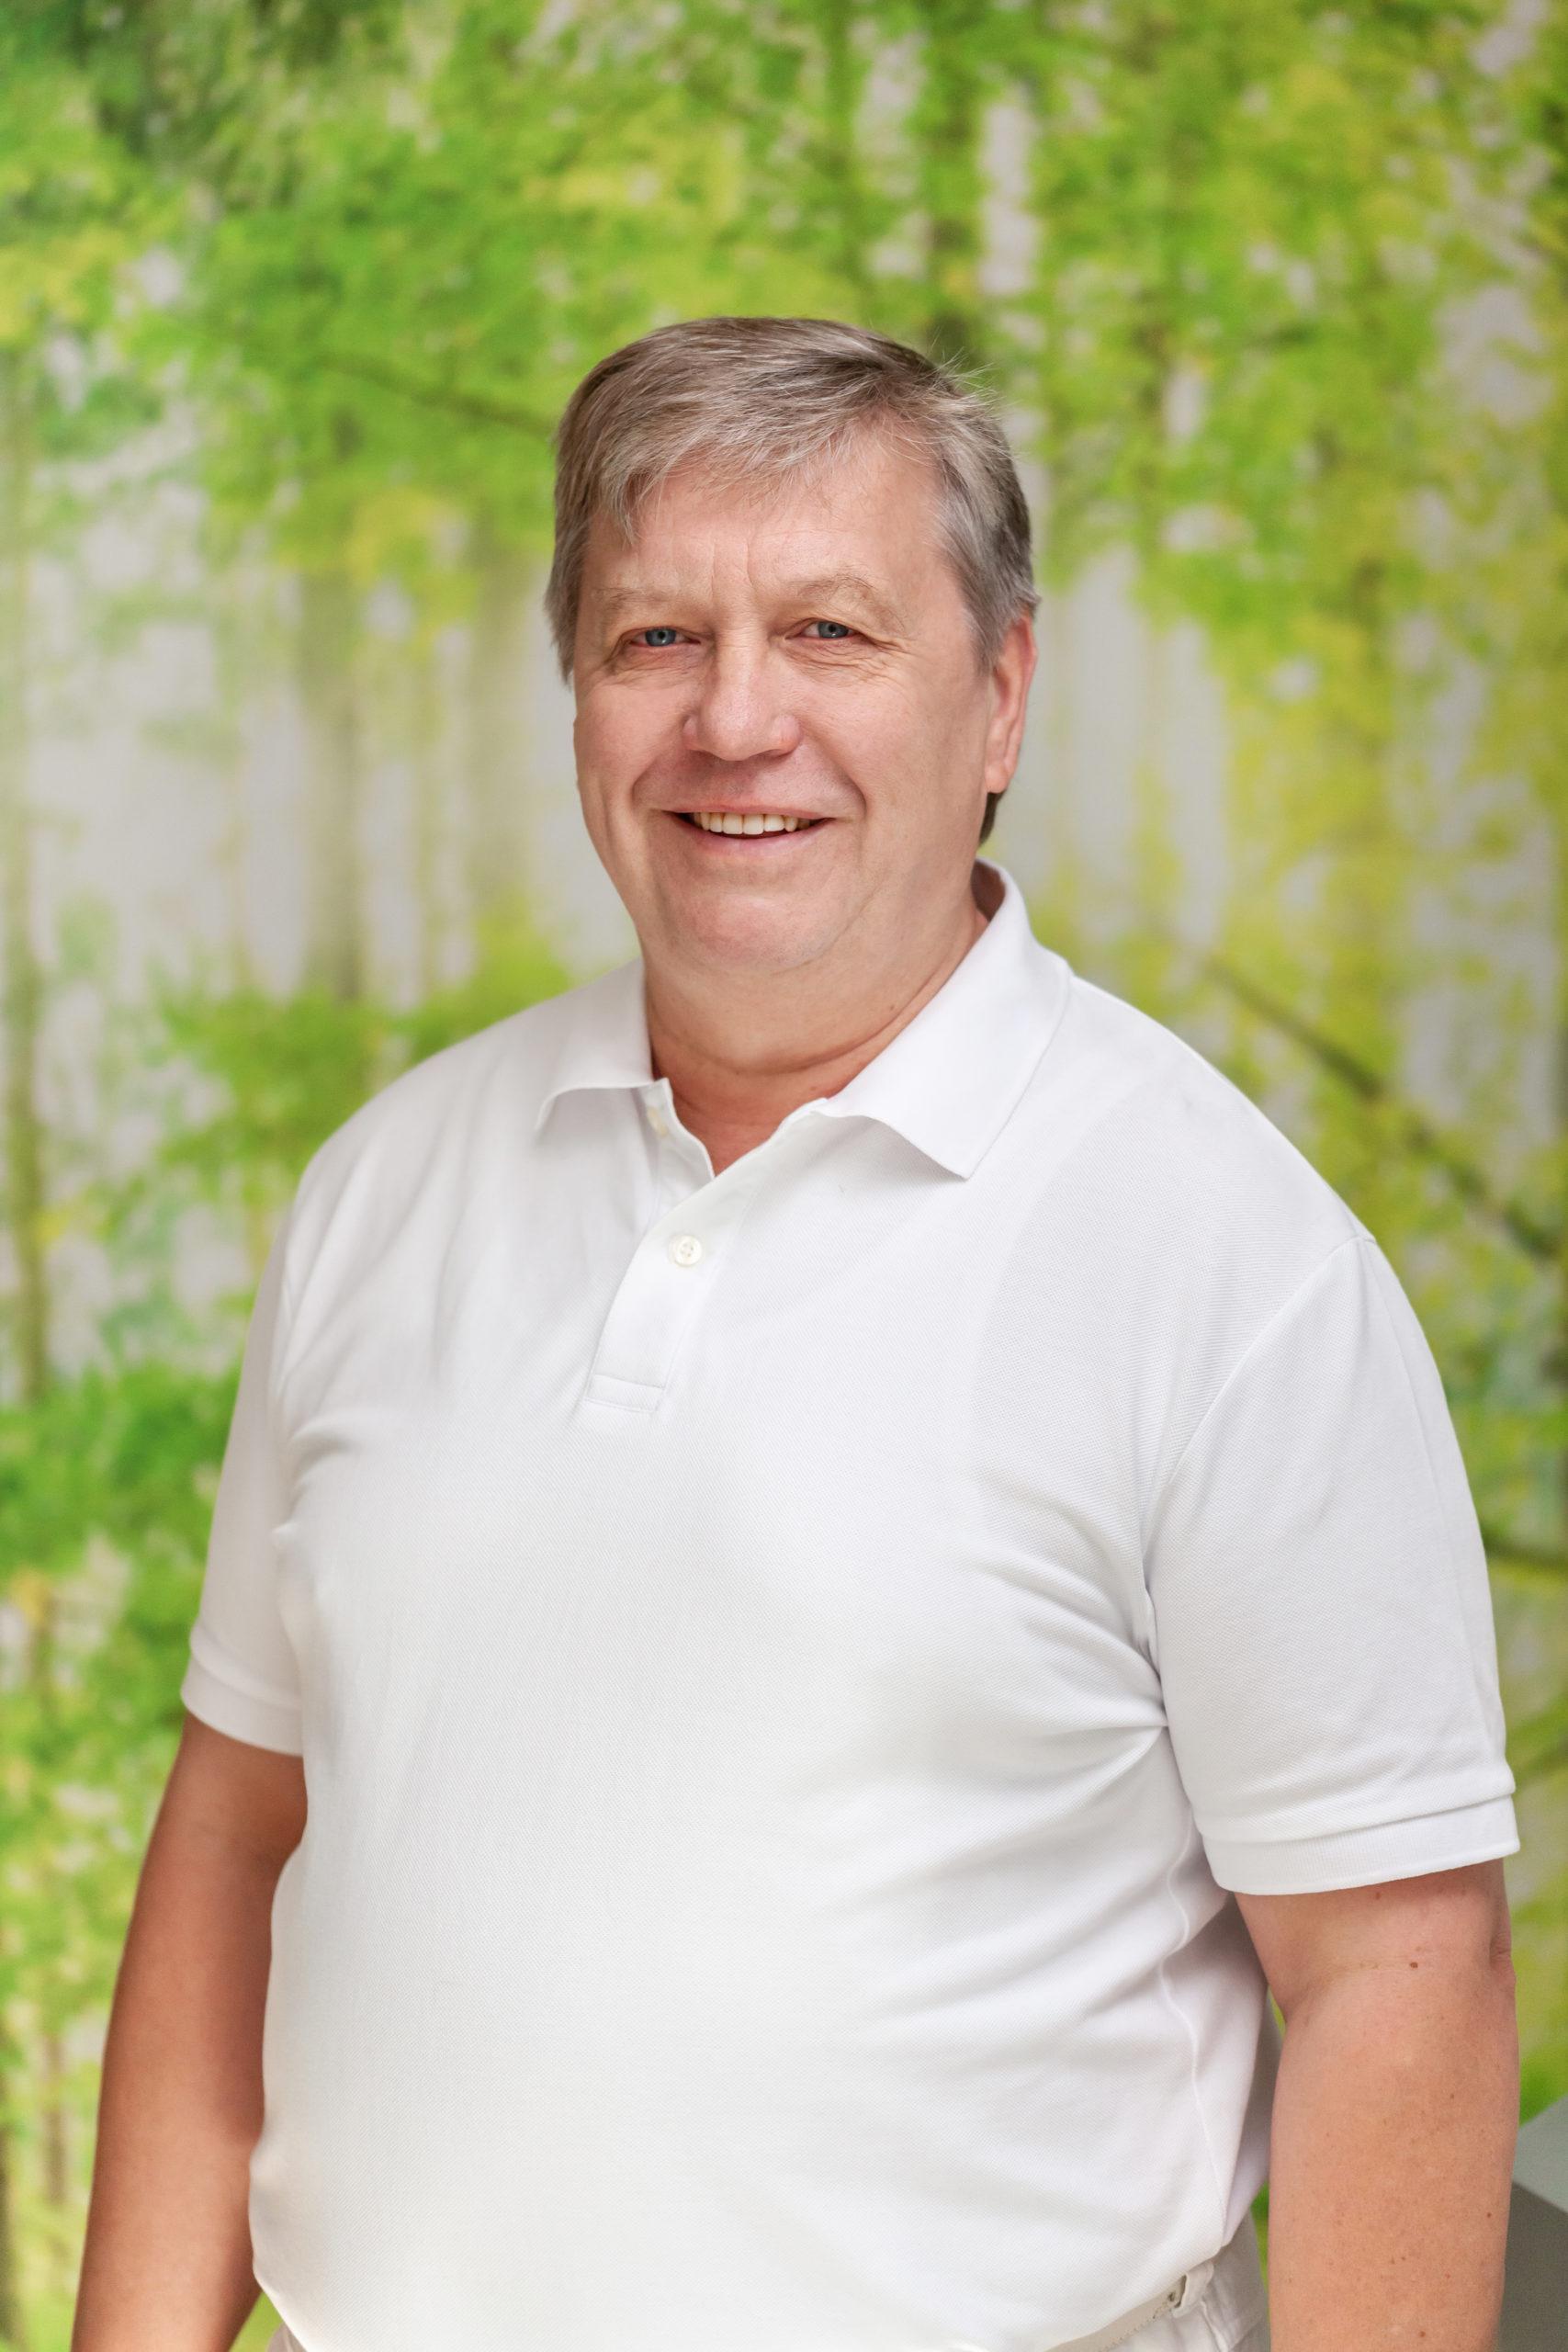 Thomas Blumenberg